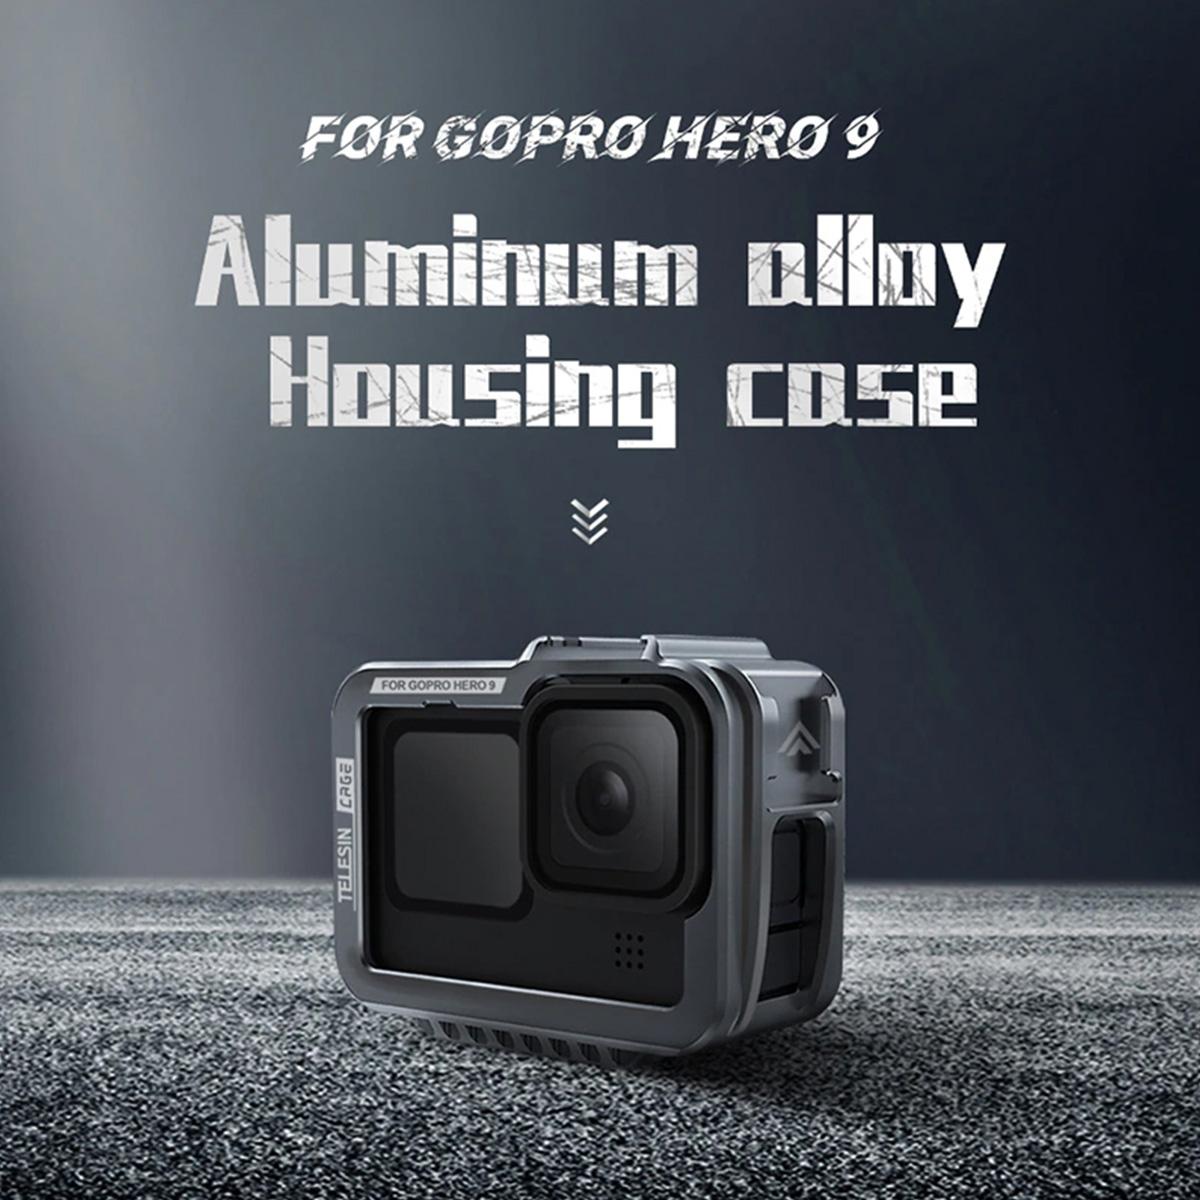 Suporte Armação Moldura Frame - Alumínio para GoPro Hero9 e Hero10 Black - Telesin